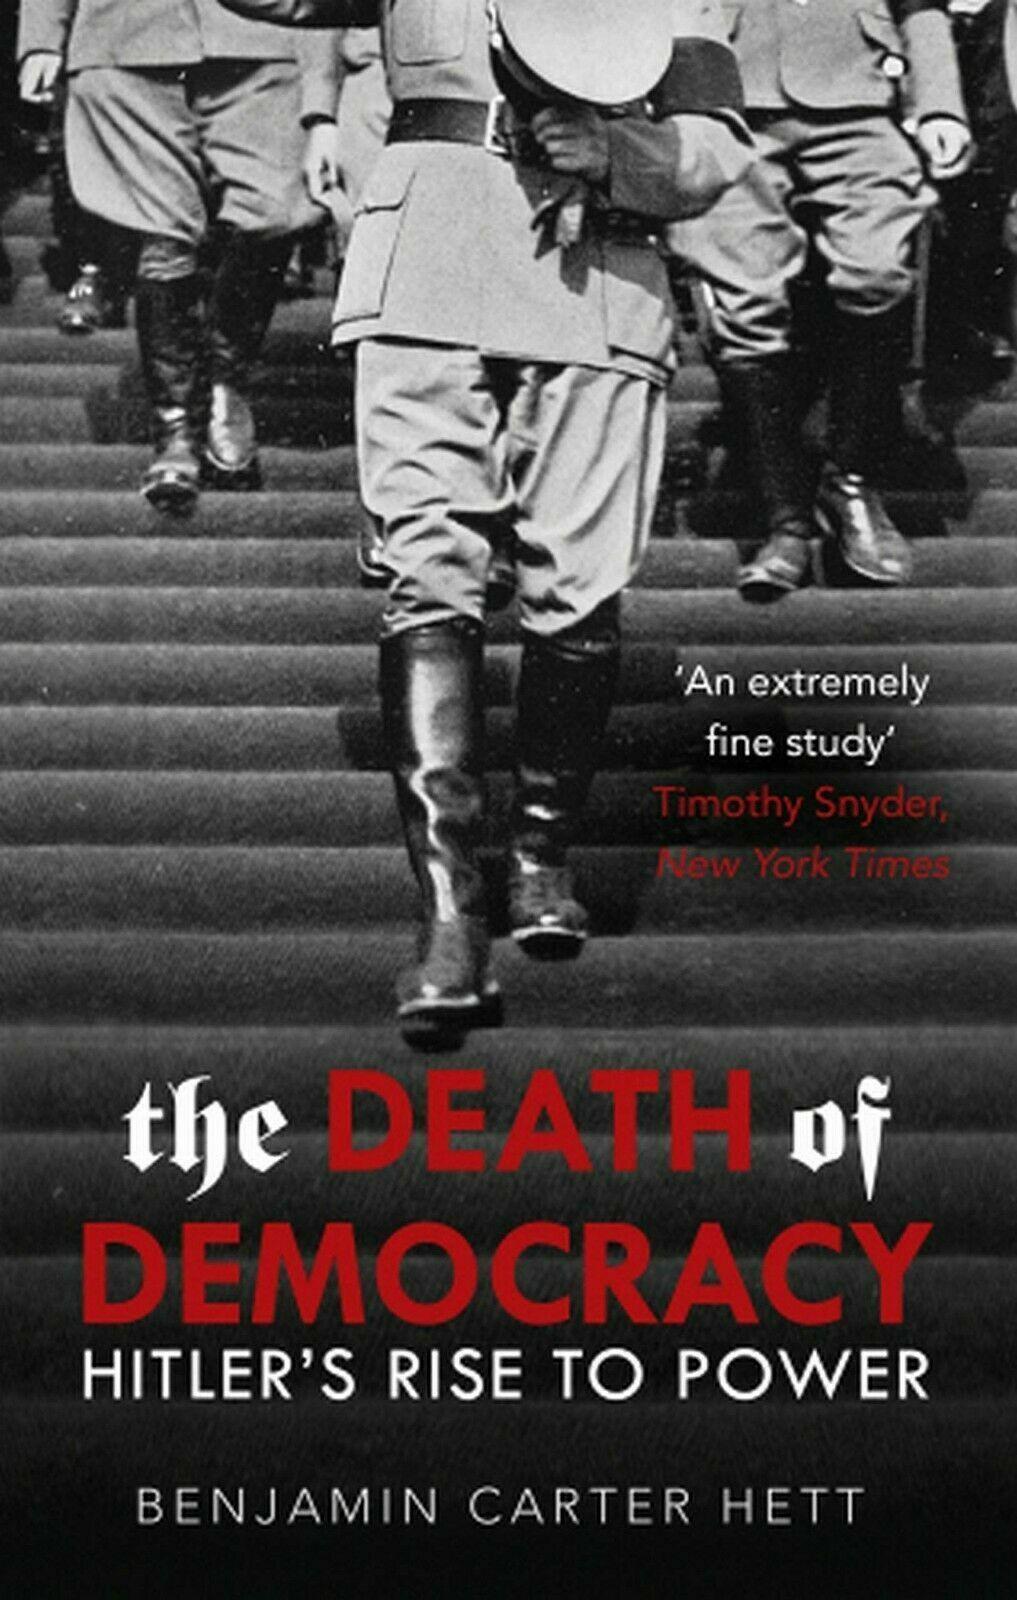 books fascism corruption Nazi military politics totalitarianism history